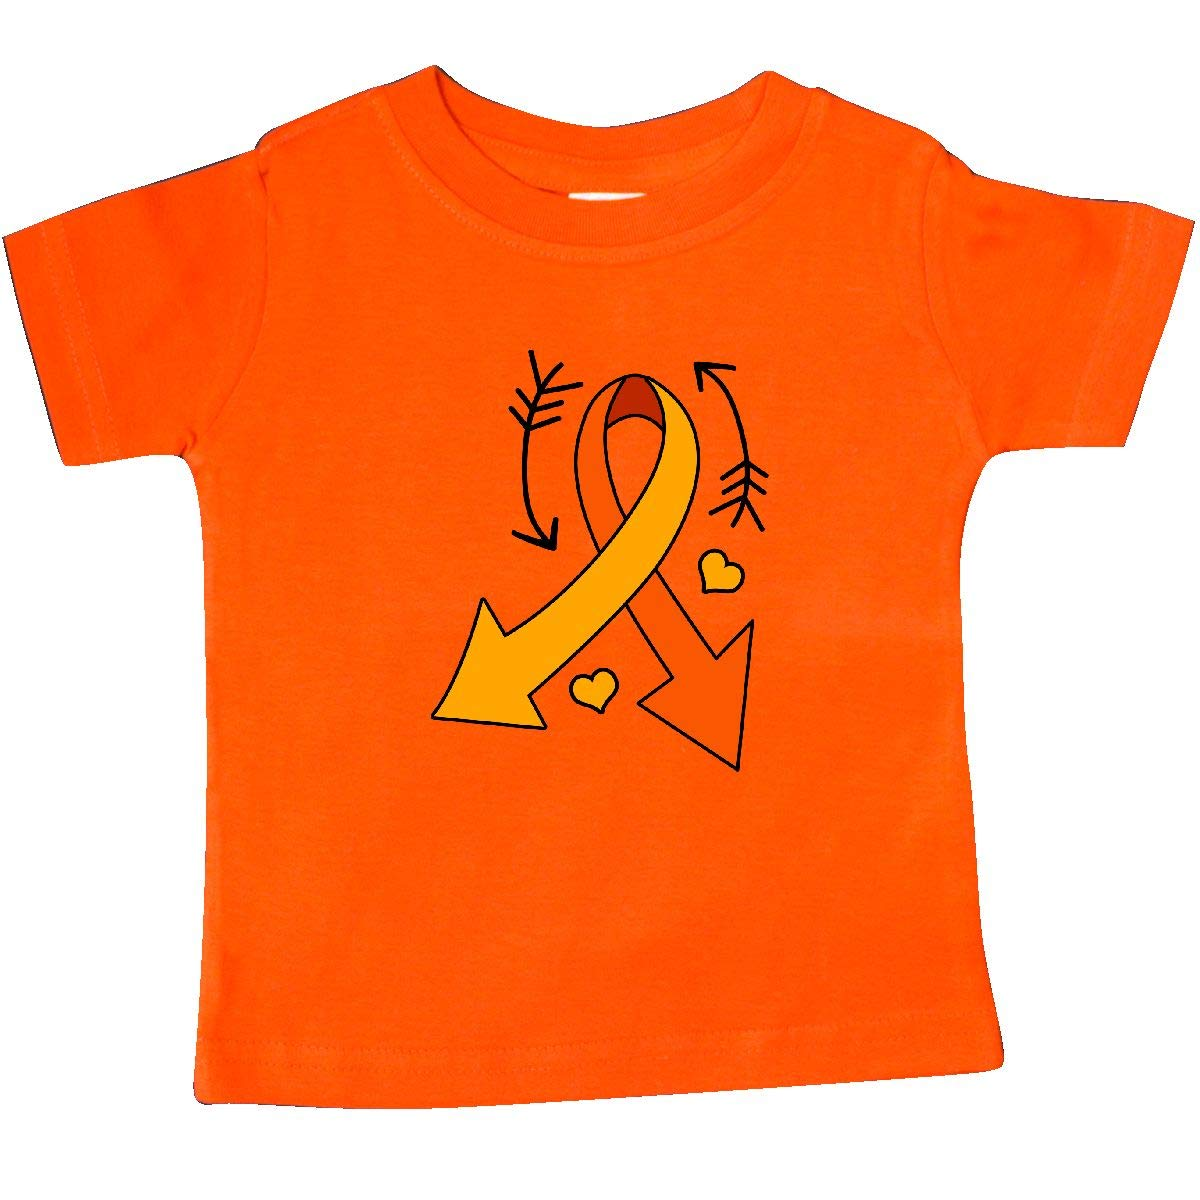 inktastic Orange Ribbon with Arrows and Hearts Leukemia Awareness Baby T-Shirt